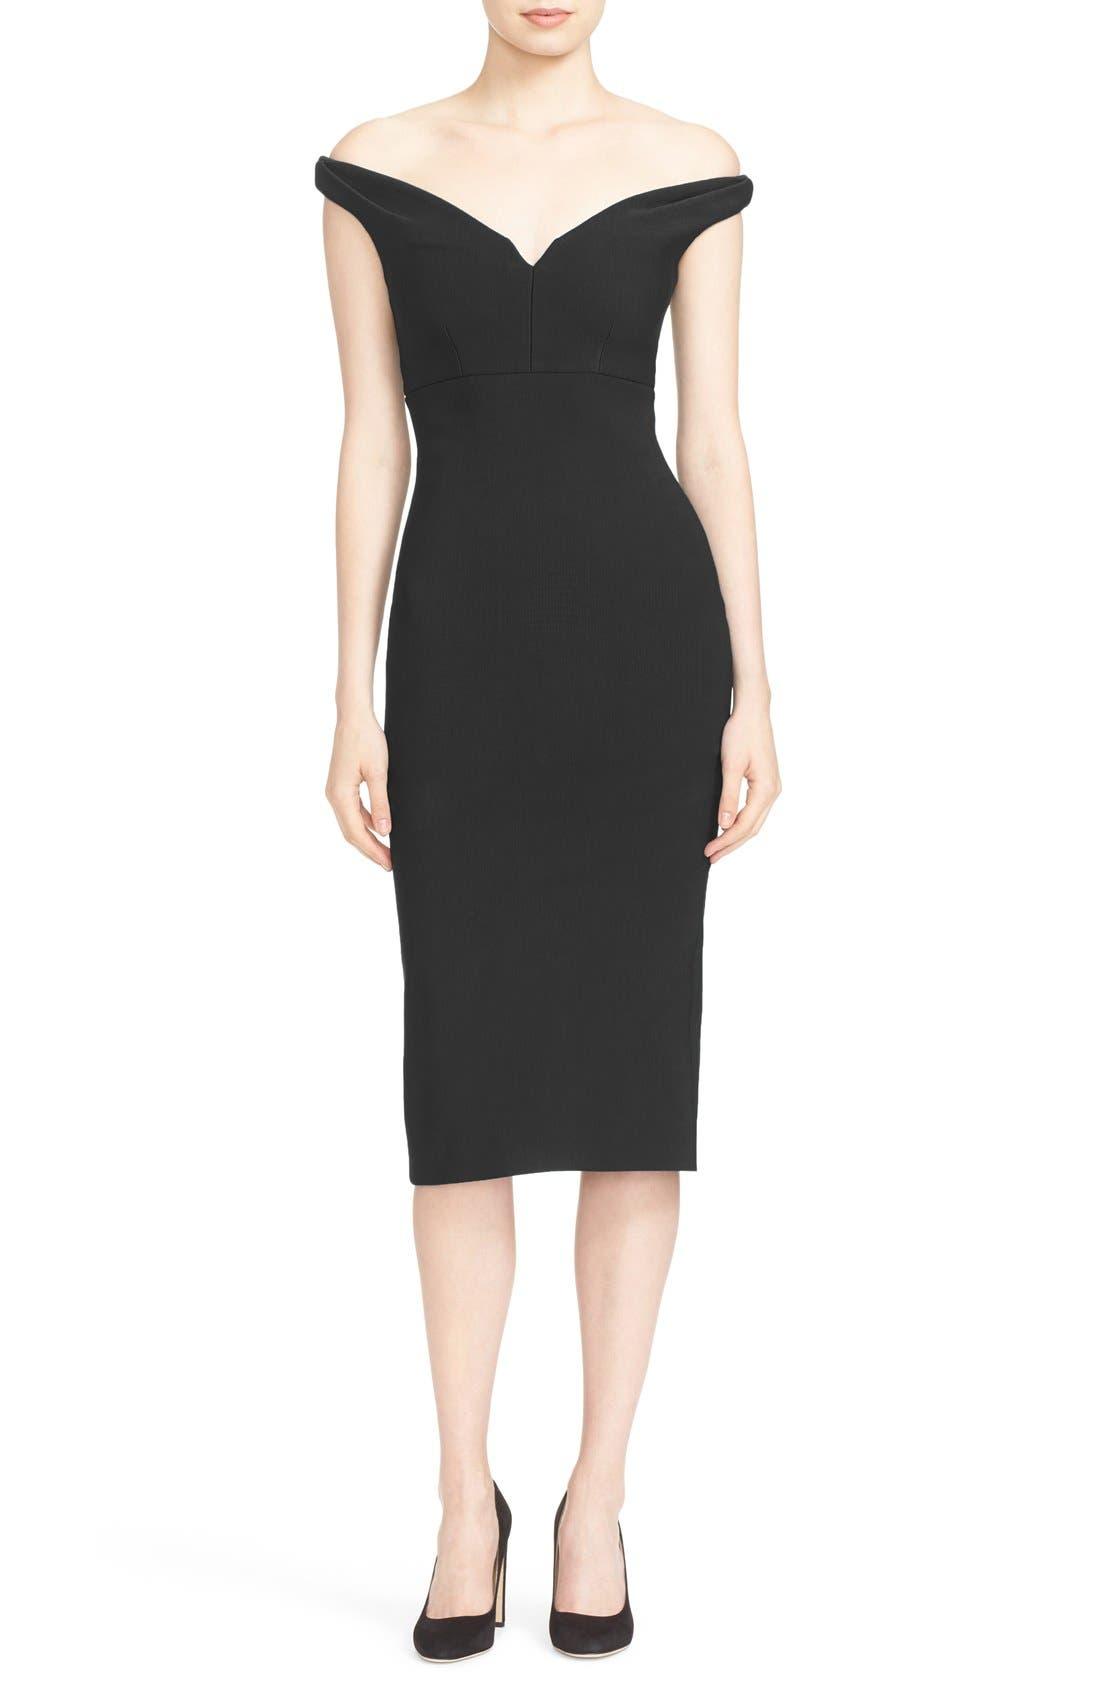 Cinq à Sept Garnet Off the Shoulder Dress